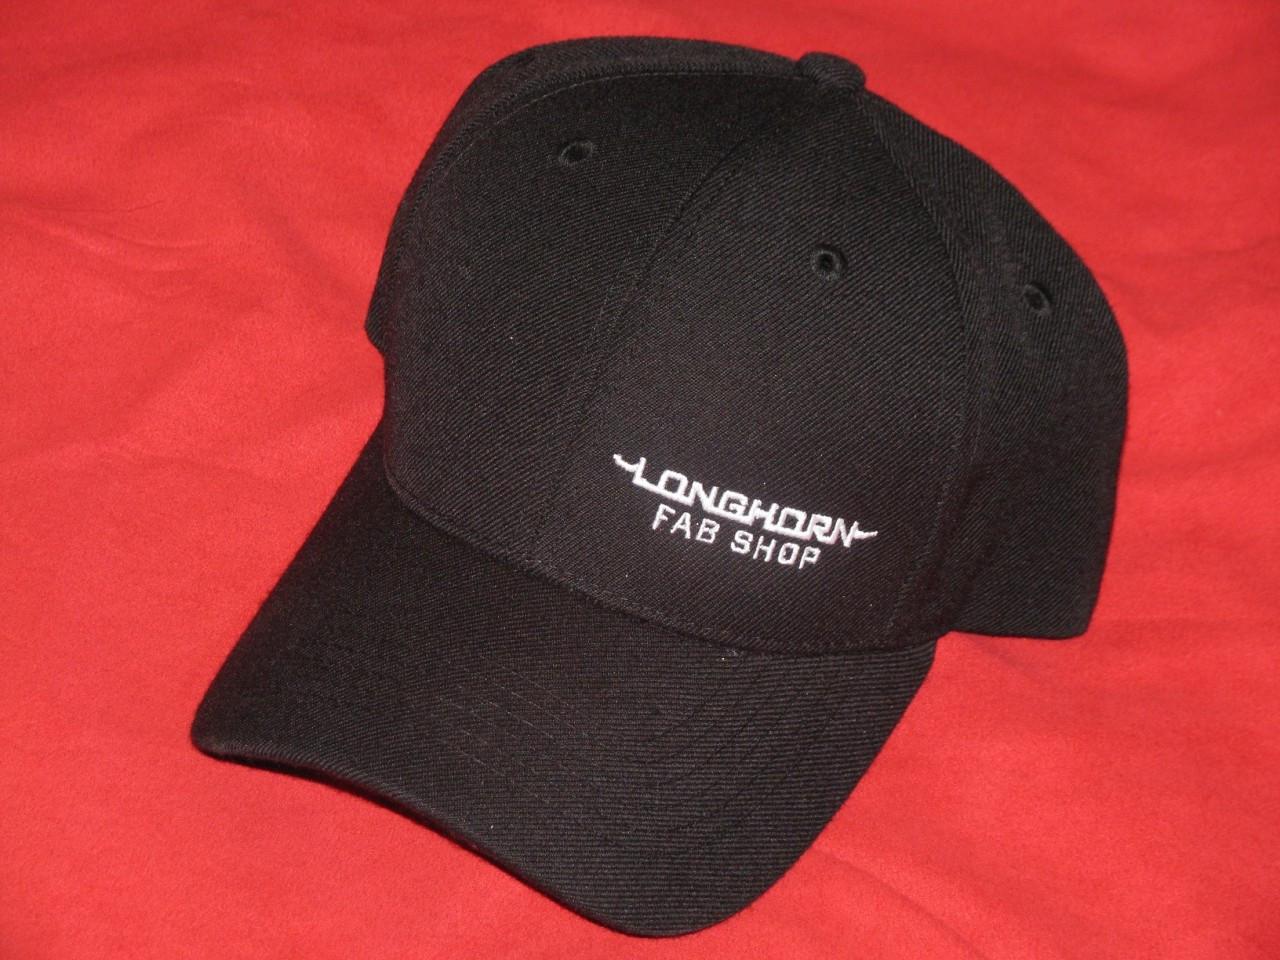 Longhorn Fab Shop Black Hat (200931)